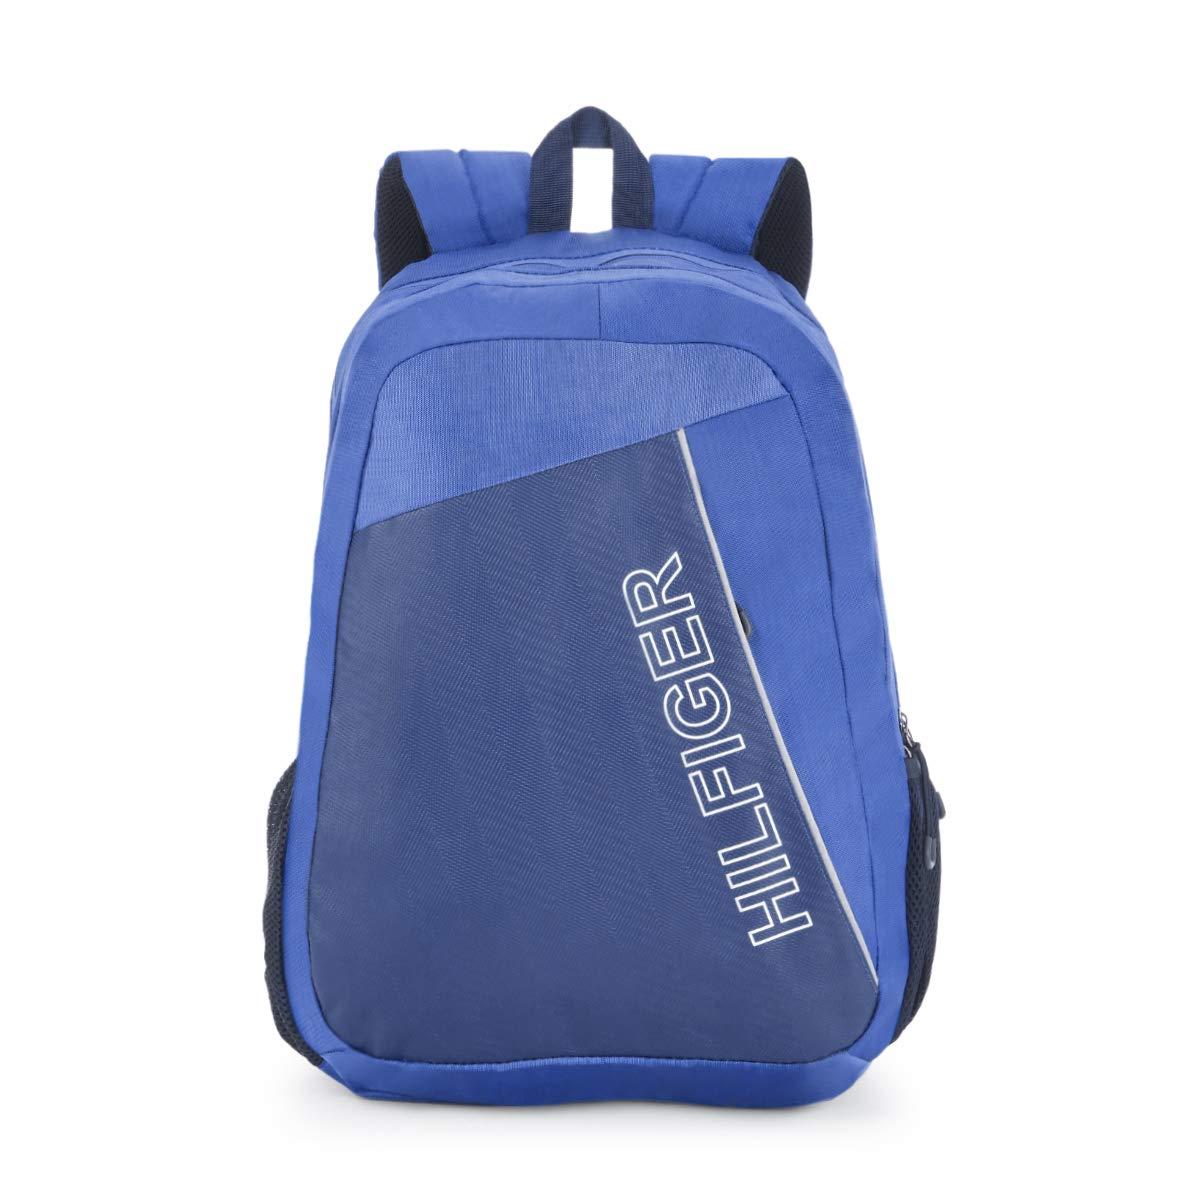 tommy-hilfiger-2356-ltrs-rblue-laptop-backpack